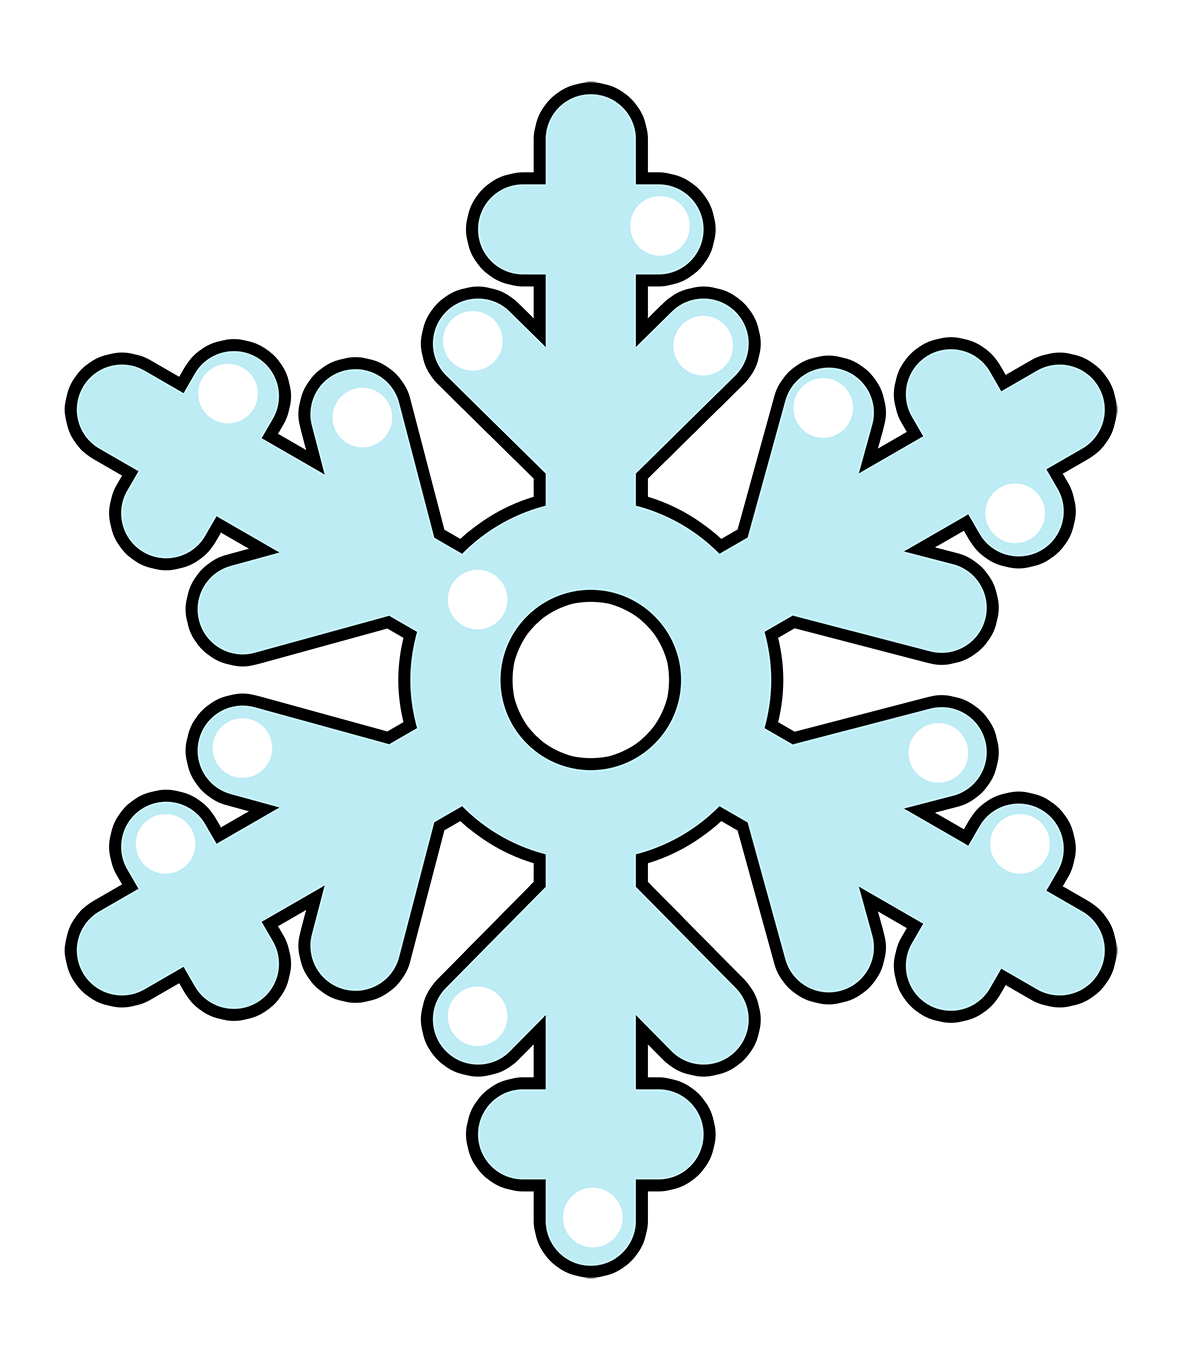 Free Cartoon Snowflake Clip Art u0026middot; snowflake9